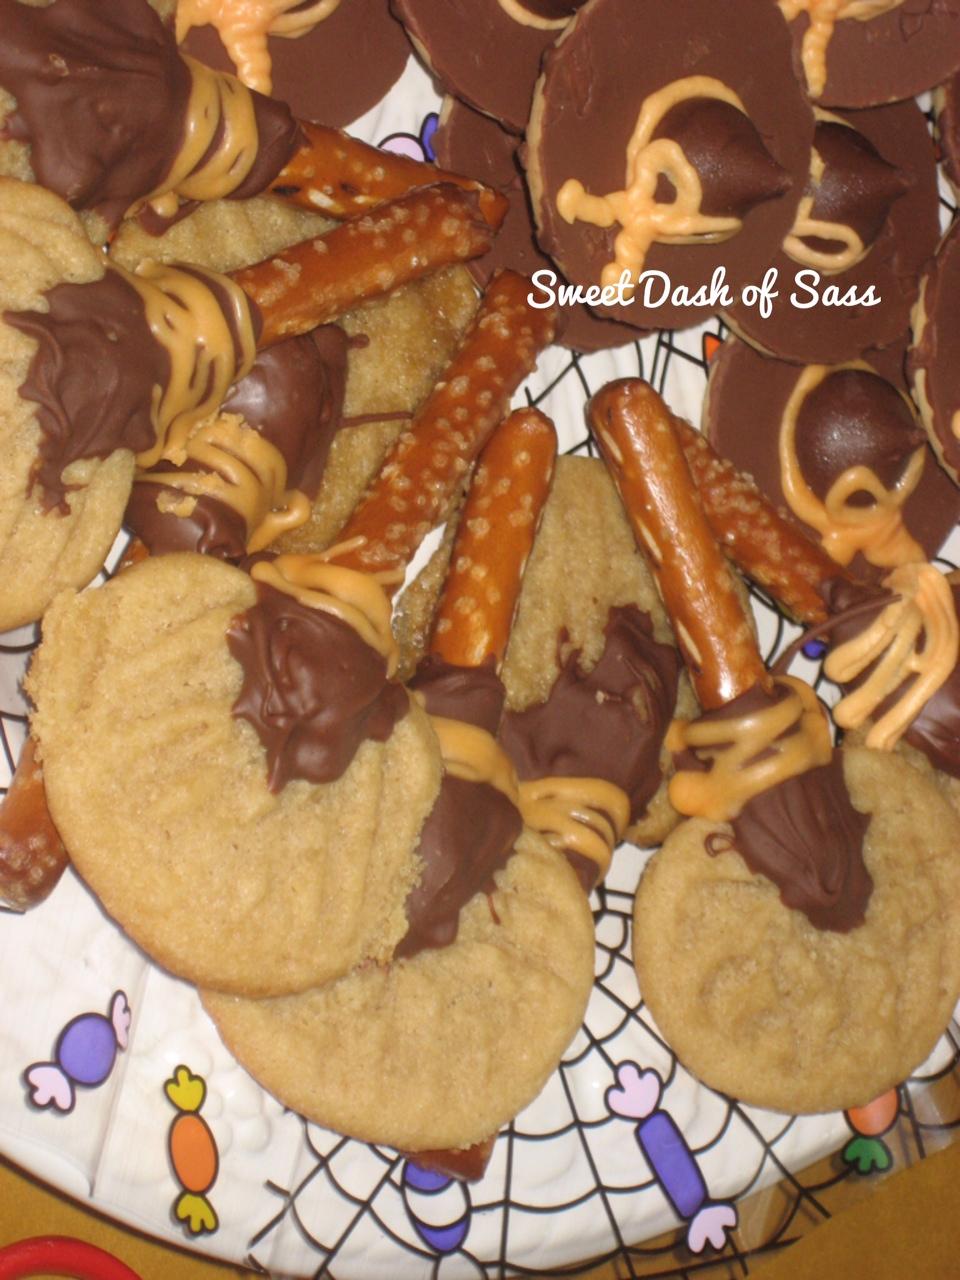 Broomstick Cookies - www.SweetDashofSass.com